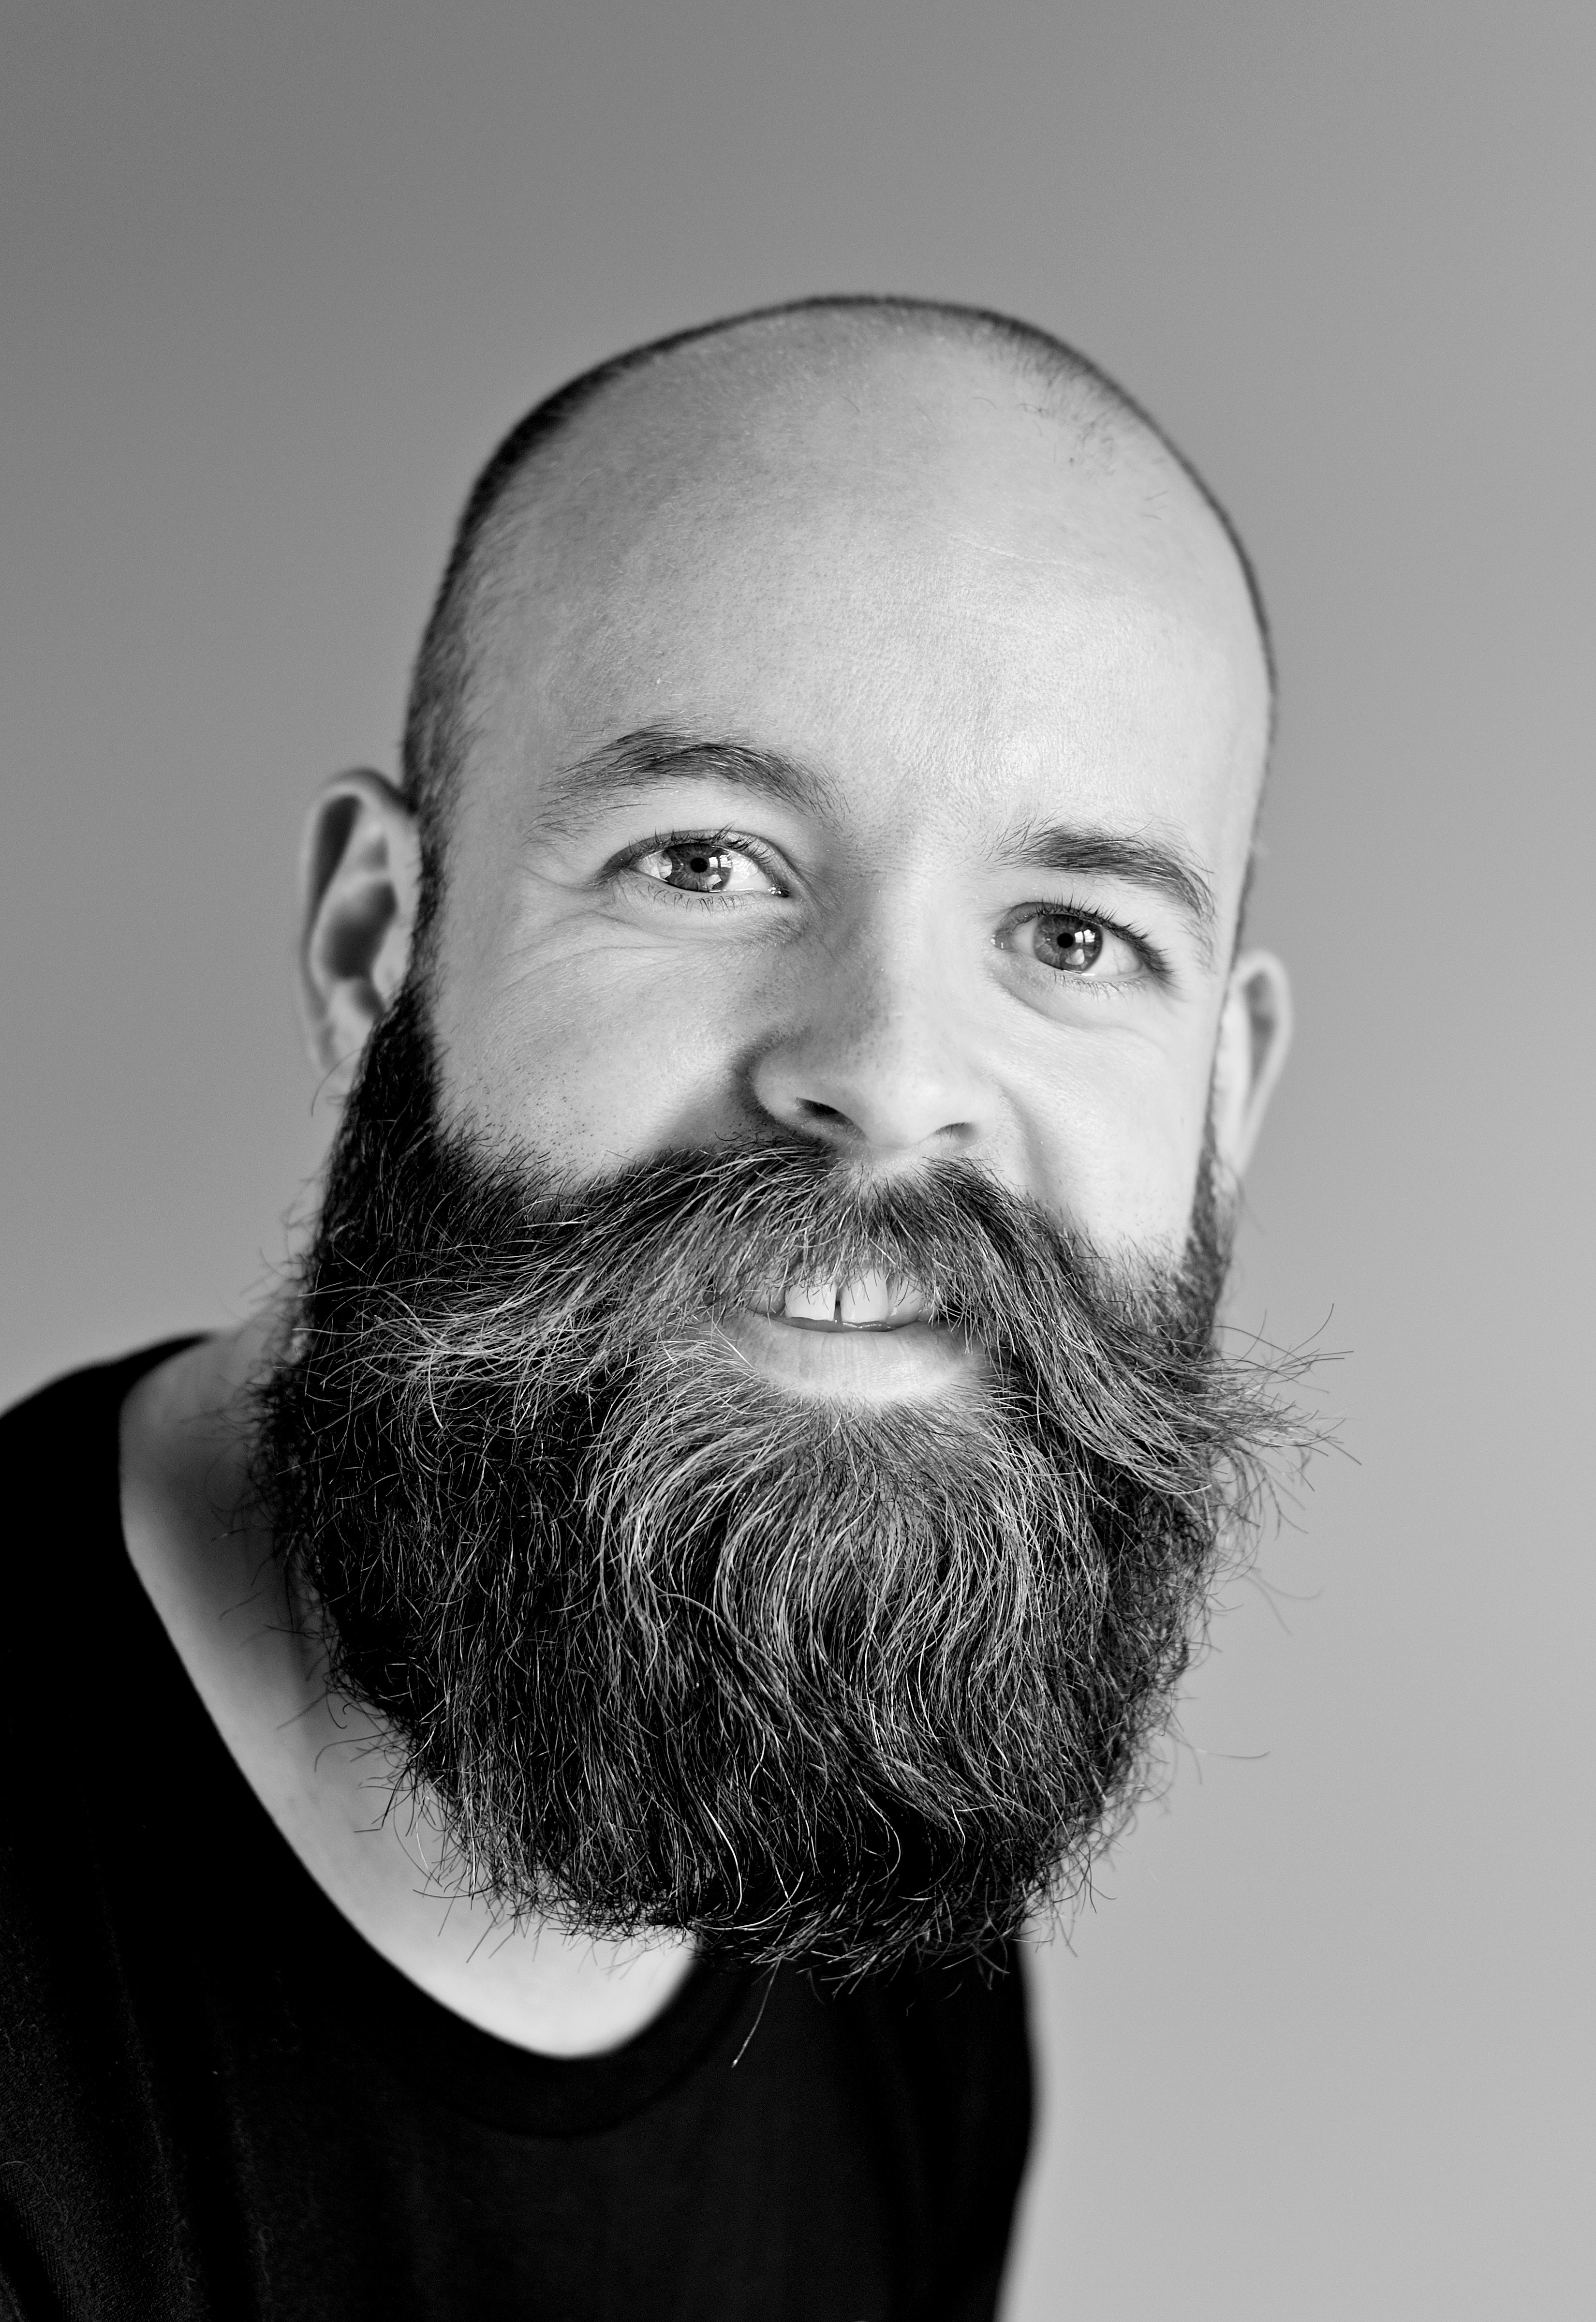 Gray Scale Bearded Man, Beard, Hair, Studio, Photoshoot, HQ Photo